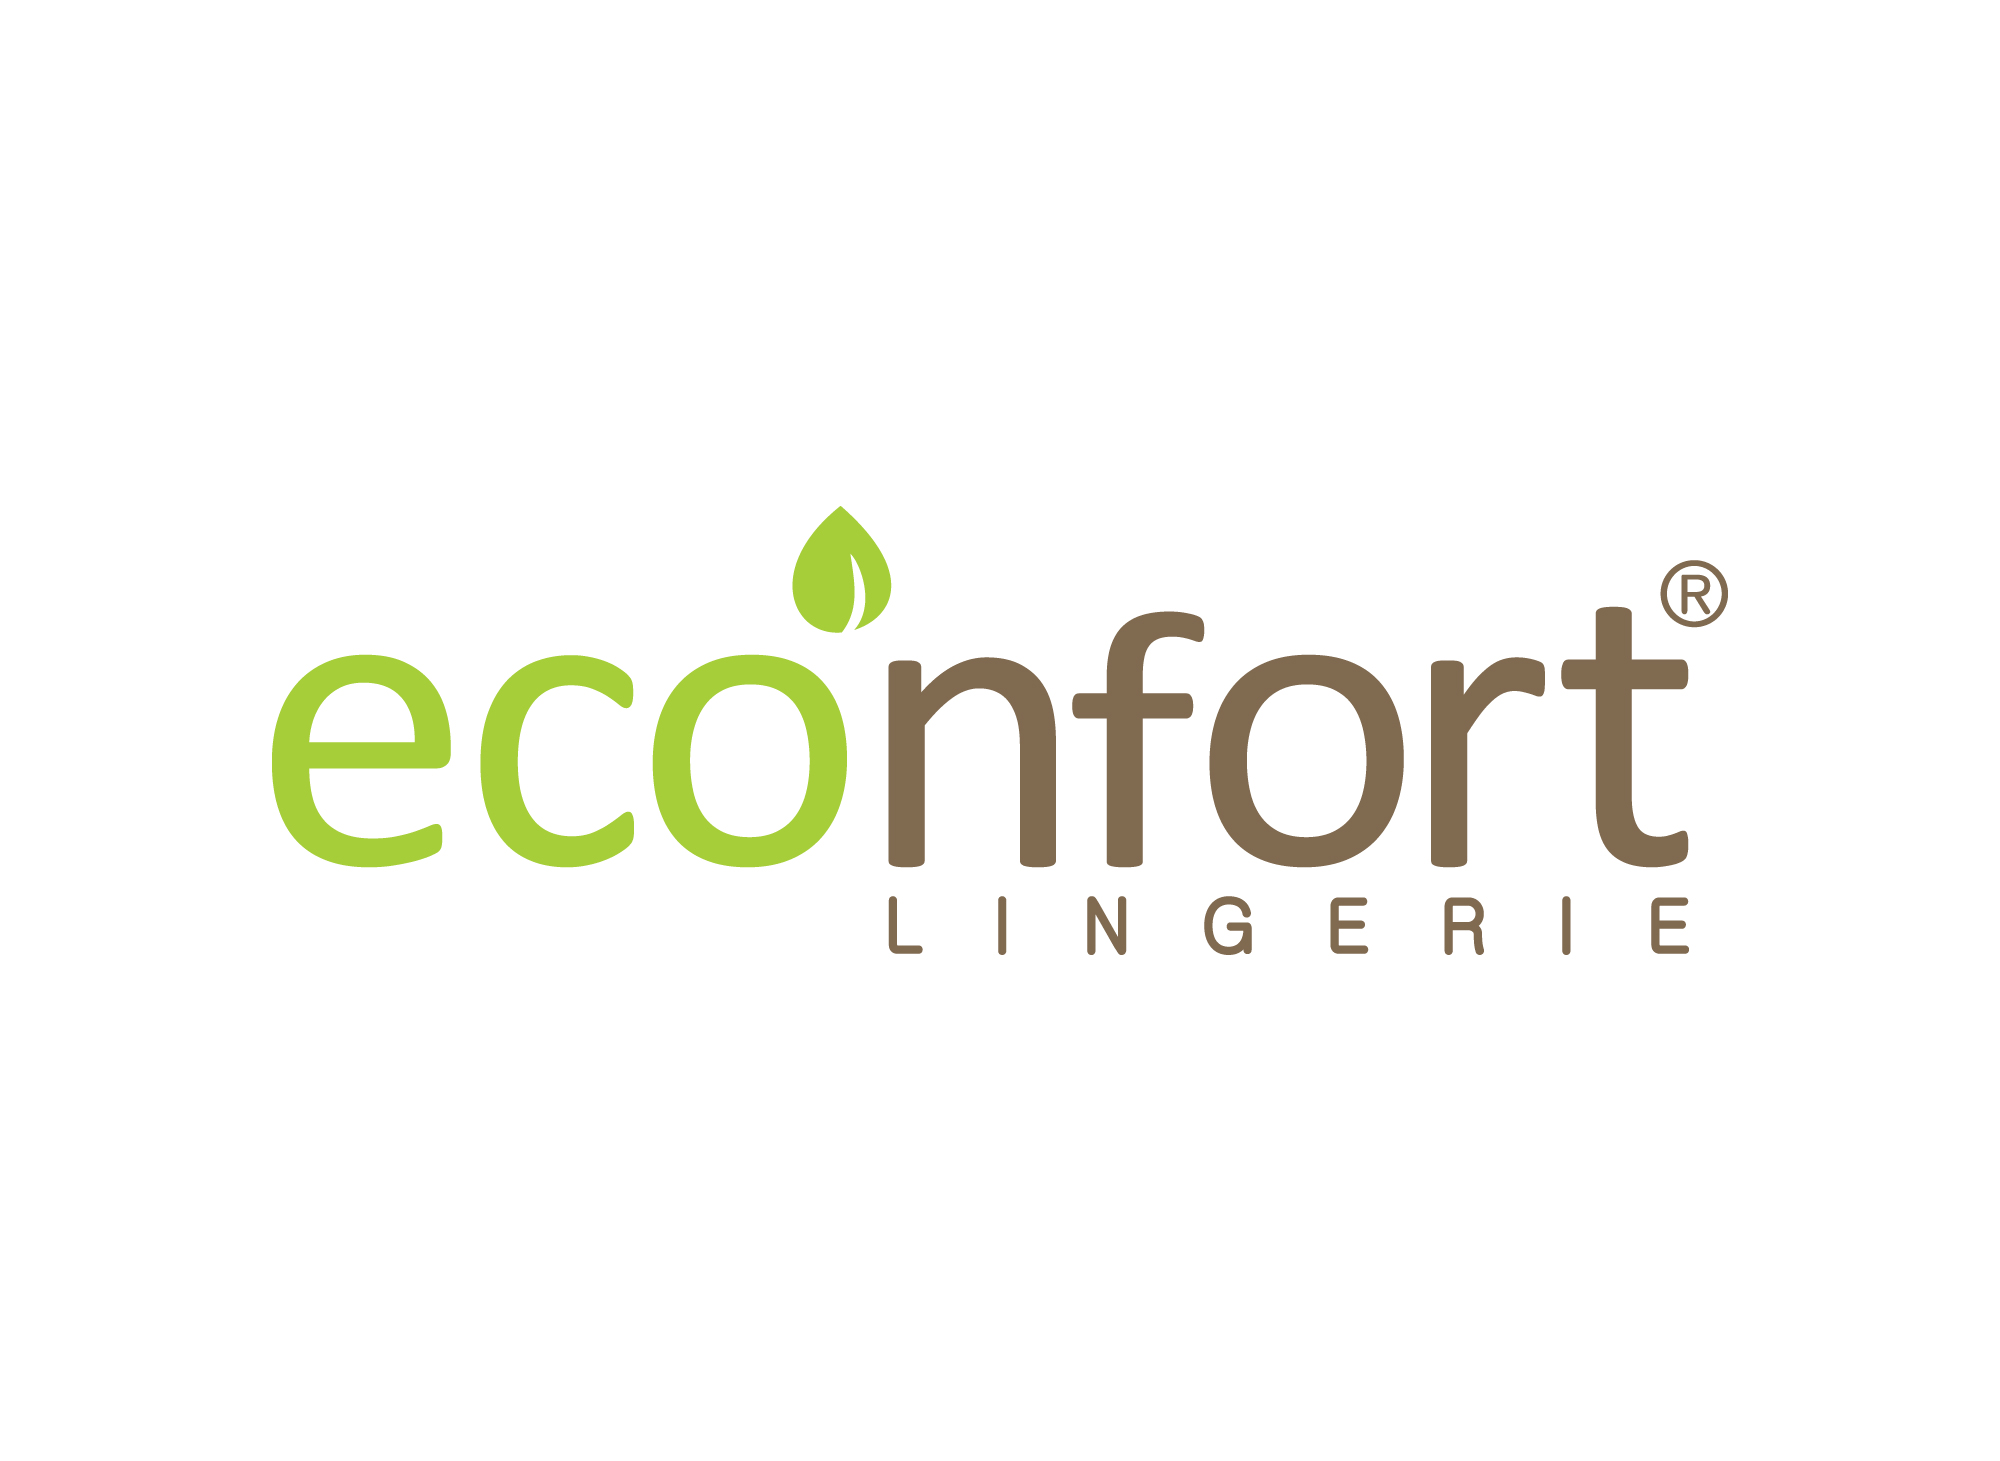 econfort-lingerie-cliente-agencia-diretriz-digital-marketing-fortaleza